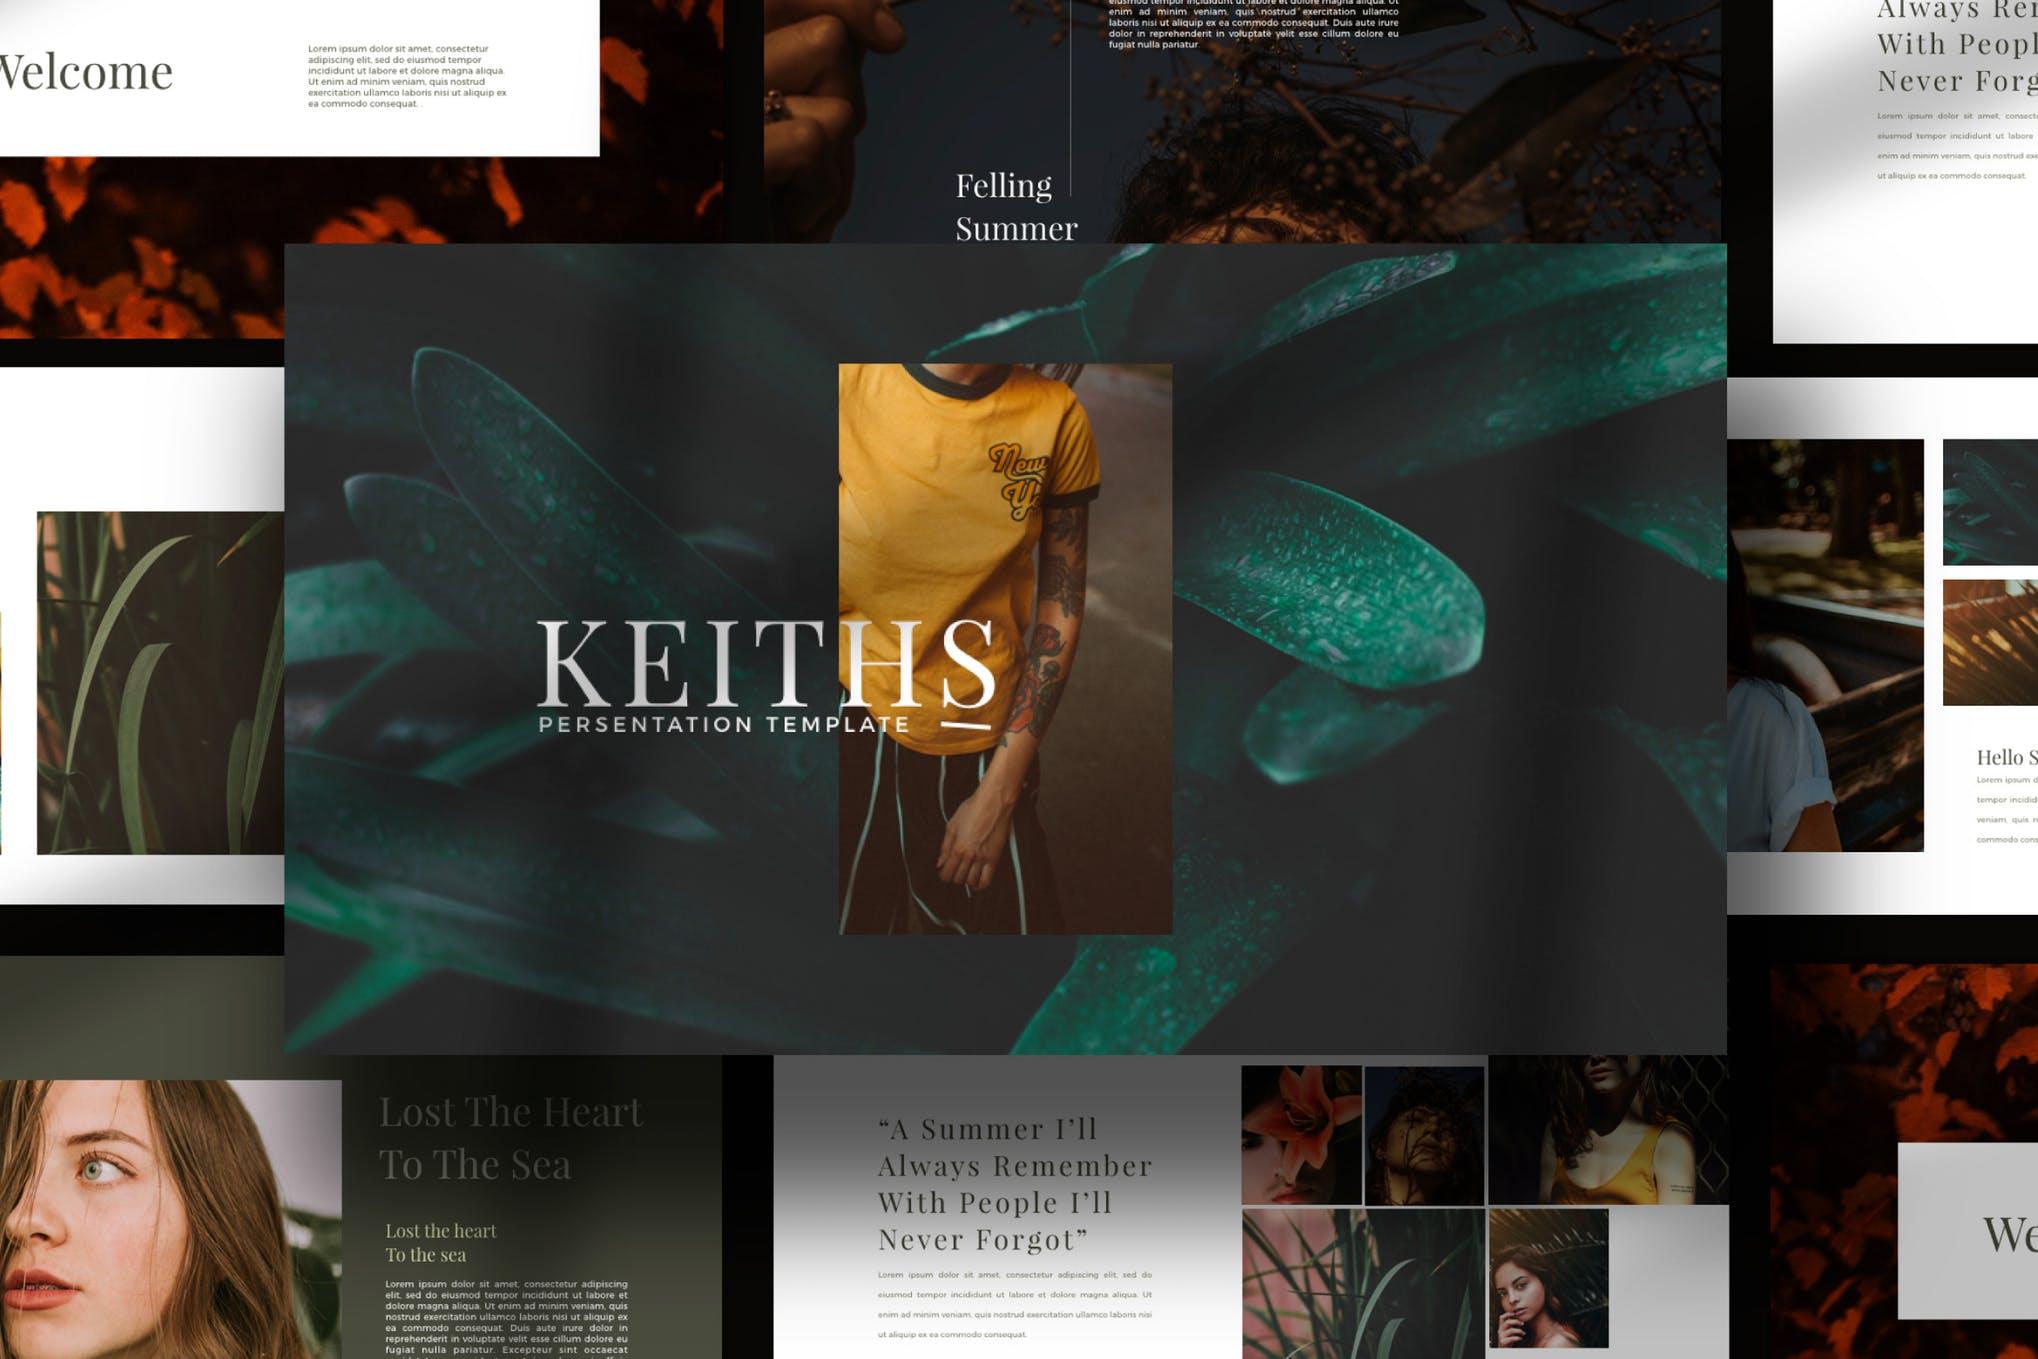 时尚简约女性服装营销设计师作品展示PPT模板KEY幻灯片SLIDES演示文稿 Keiths – Powerpoint, Keynote and Google Slides Templates插图(1)